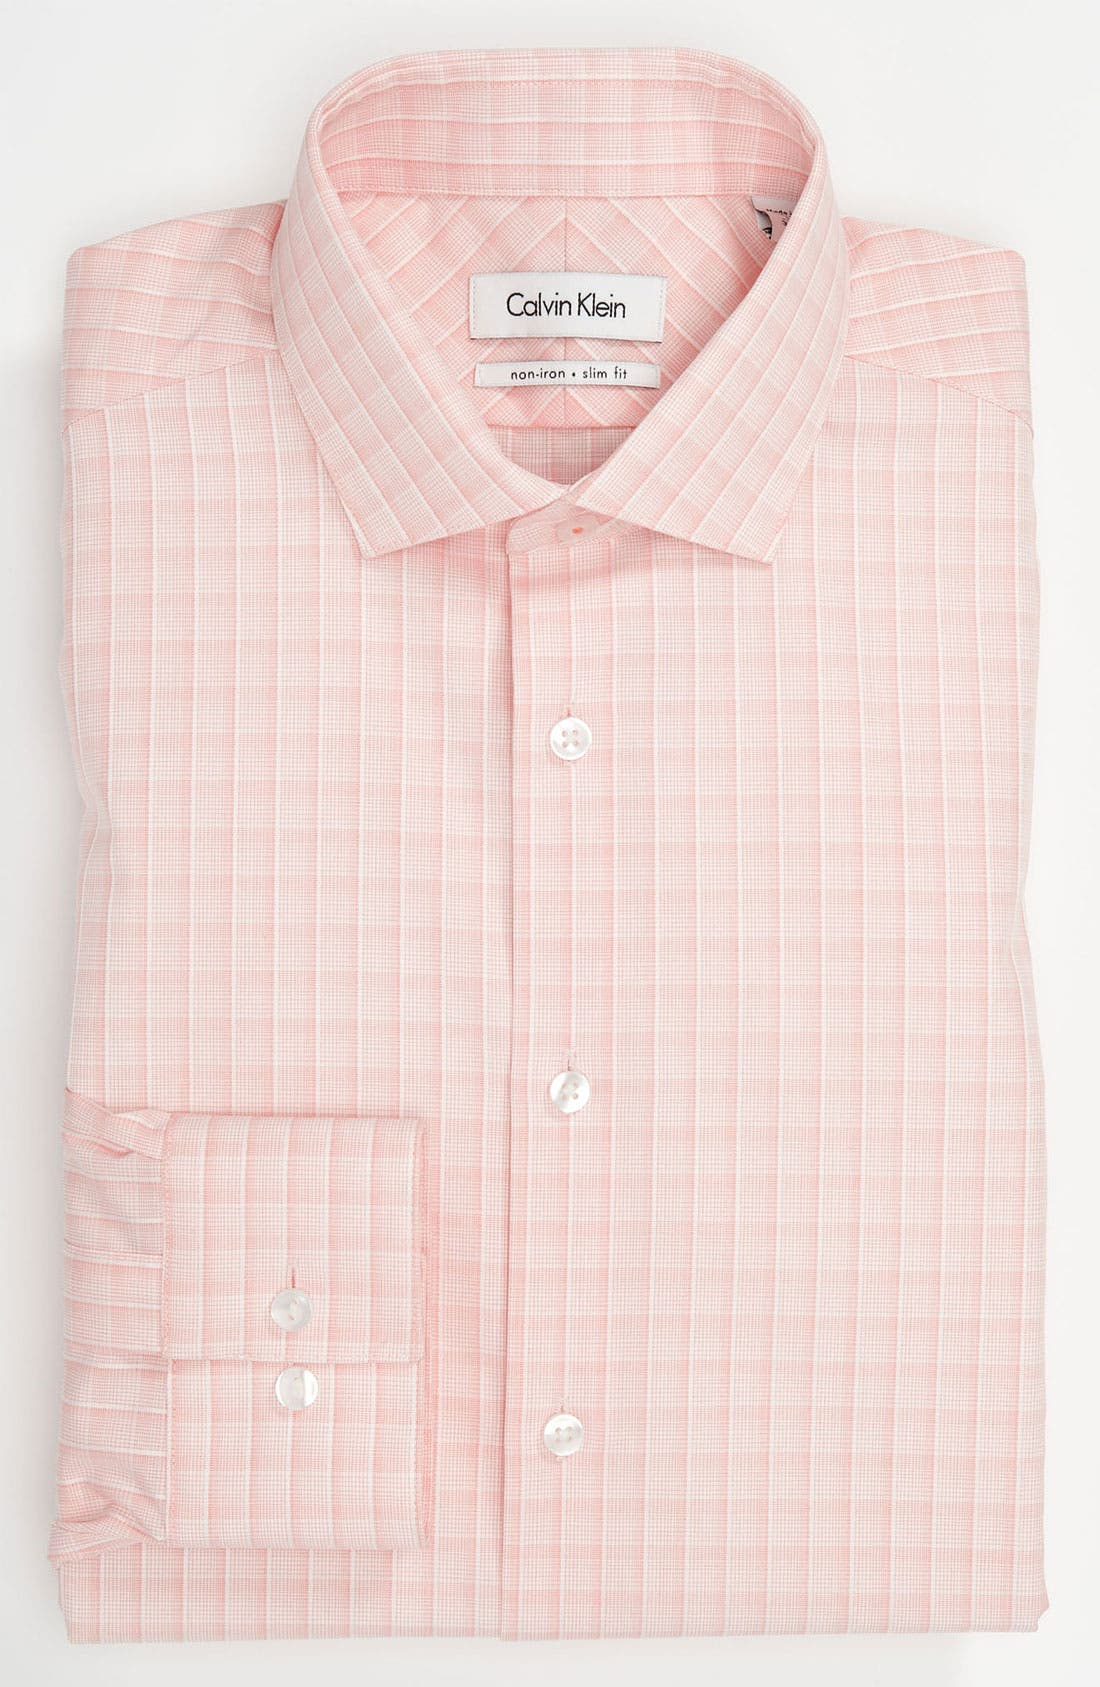 Alternate Image 1 Selected - Calvin Klein 'Montecarlo Check' Slim Fit Dress Shirt